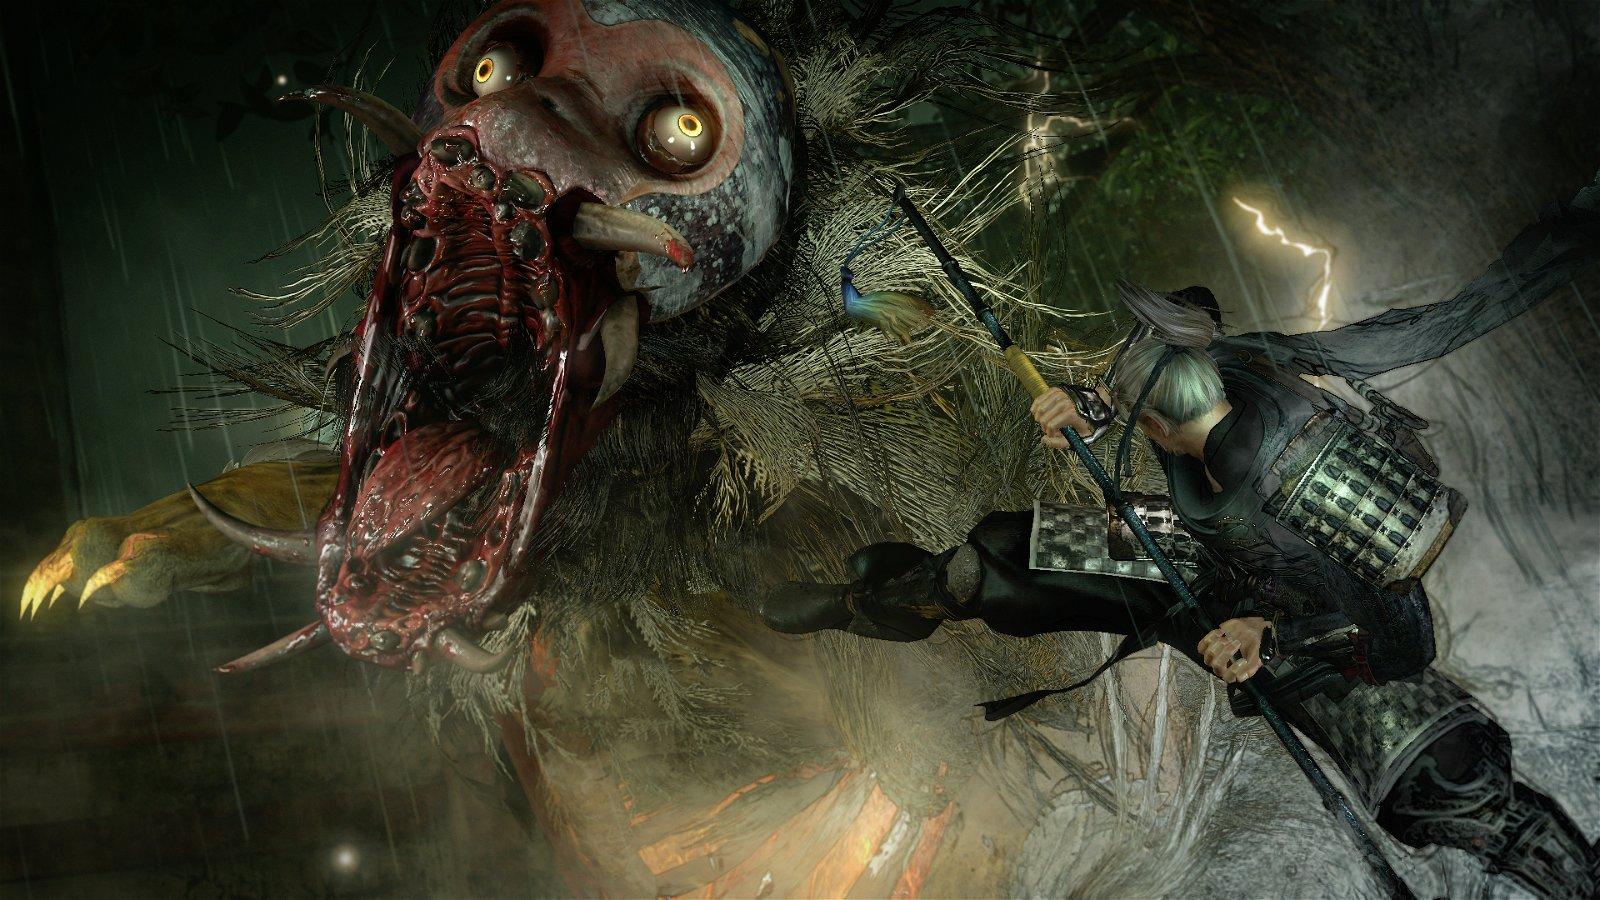 Nioh: Complete Edition (Pc) Review - Samurai Souls Comes To Pc